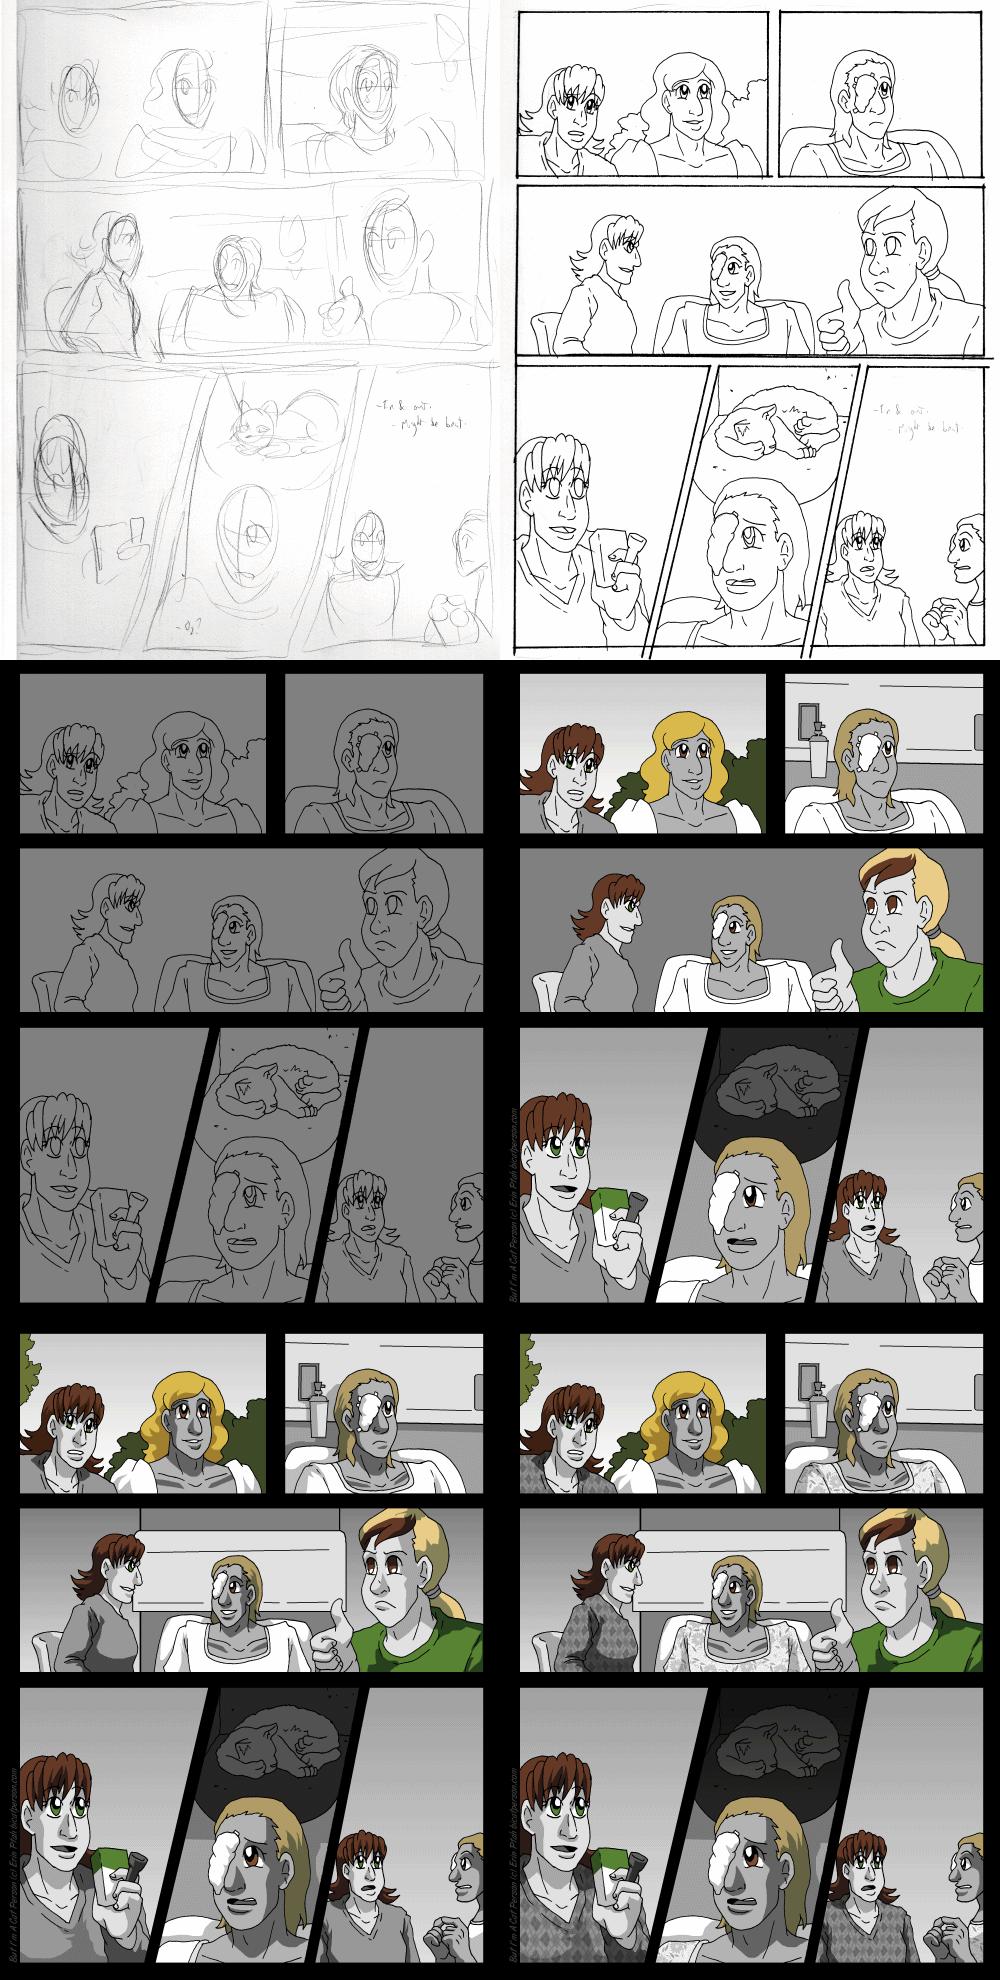 The webcomic page-making process